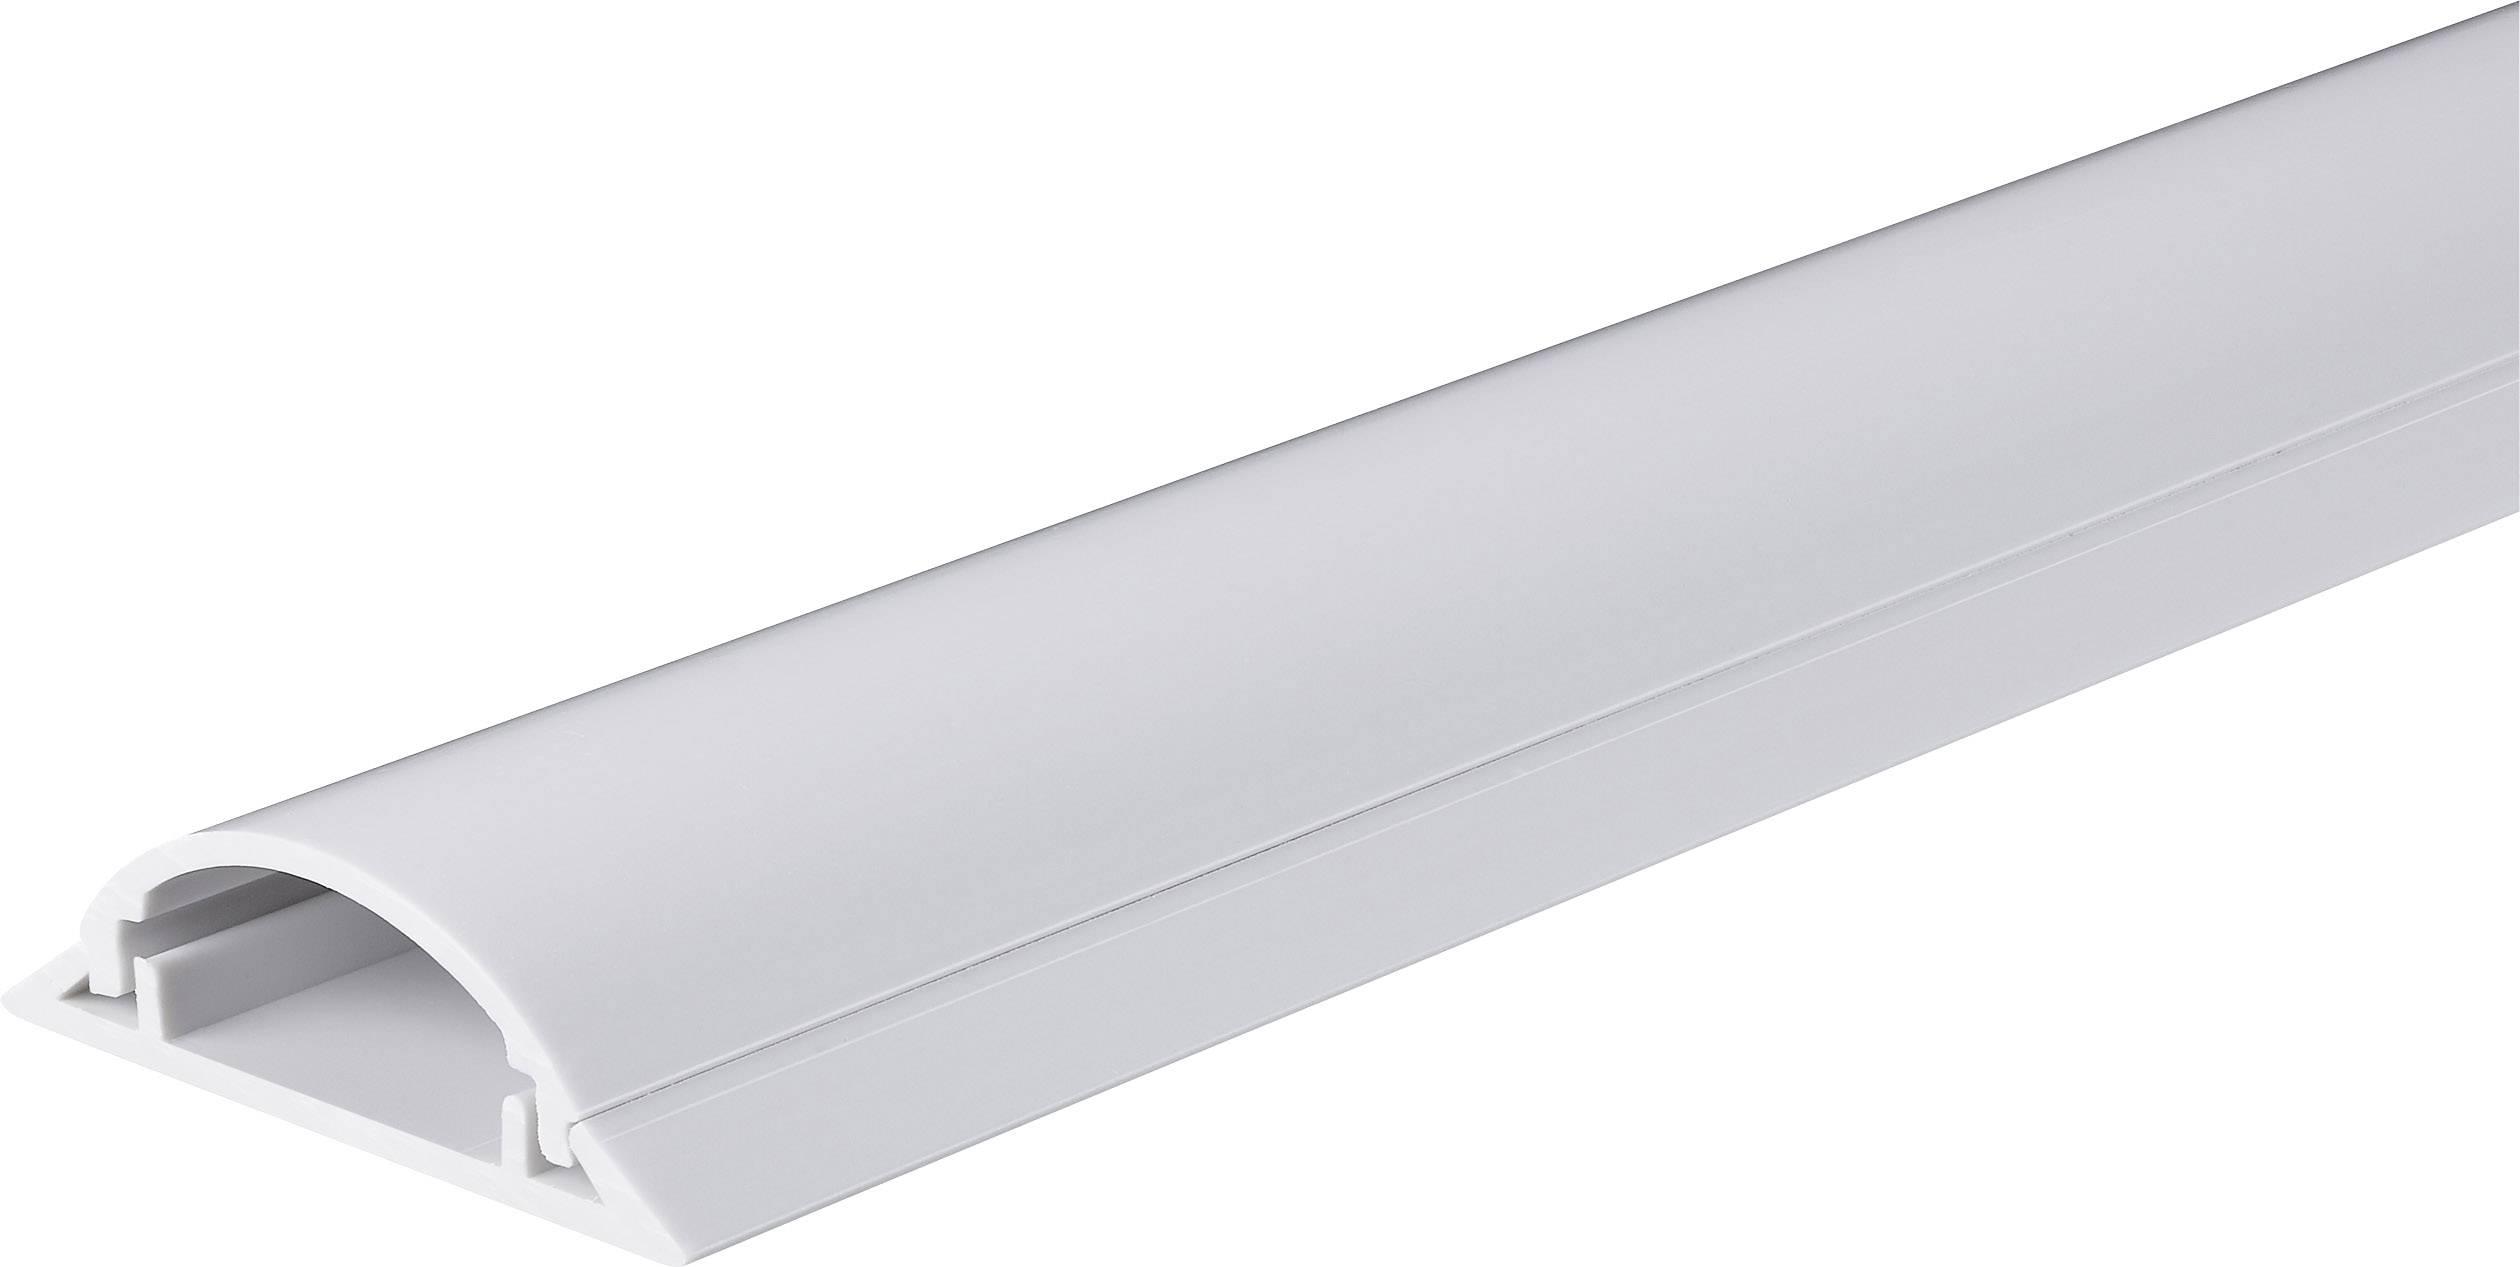 Kabelový můstek Conrad 1243961, bílá, 1000 x 49,5 mm